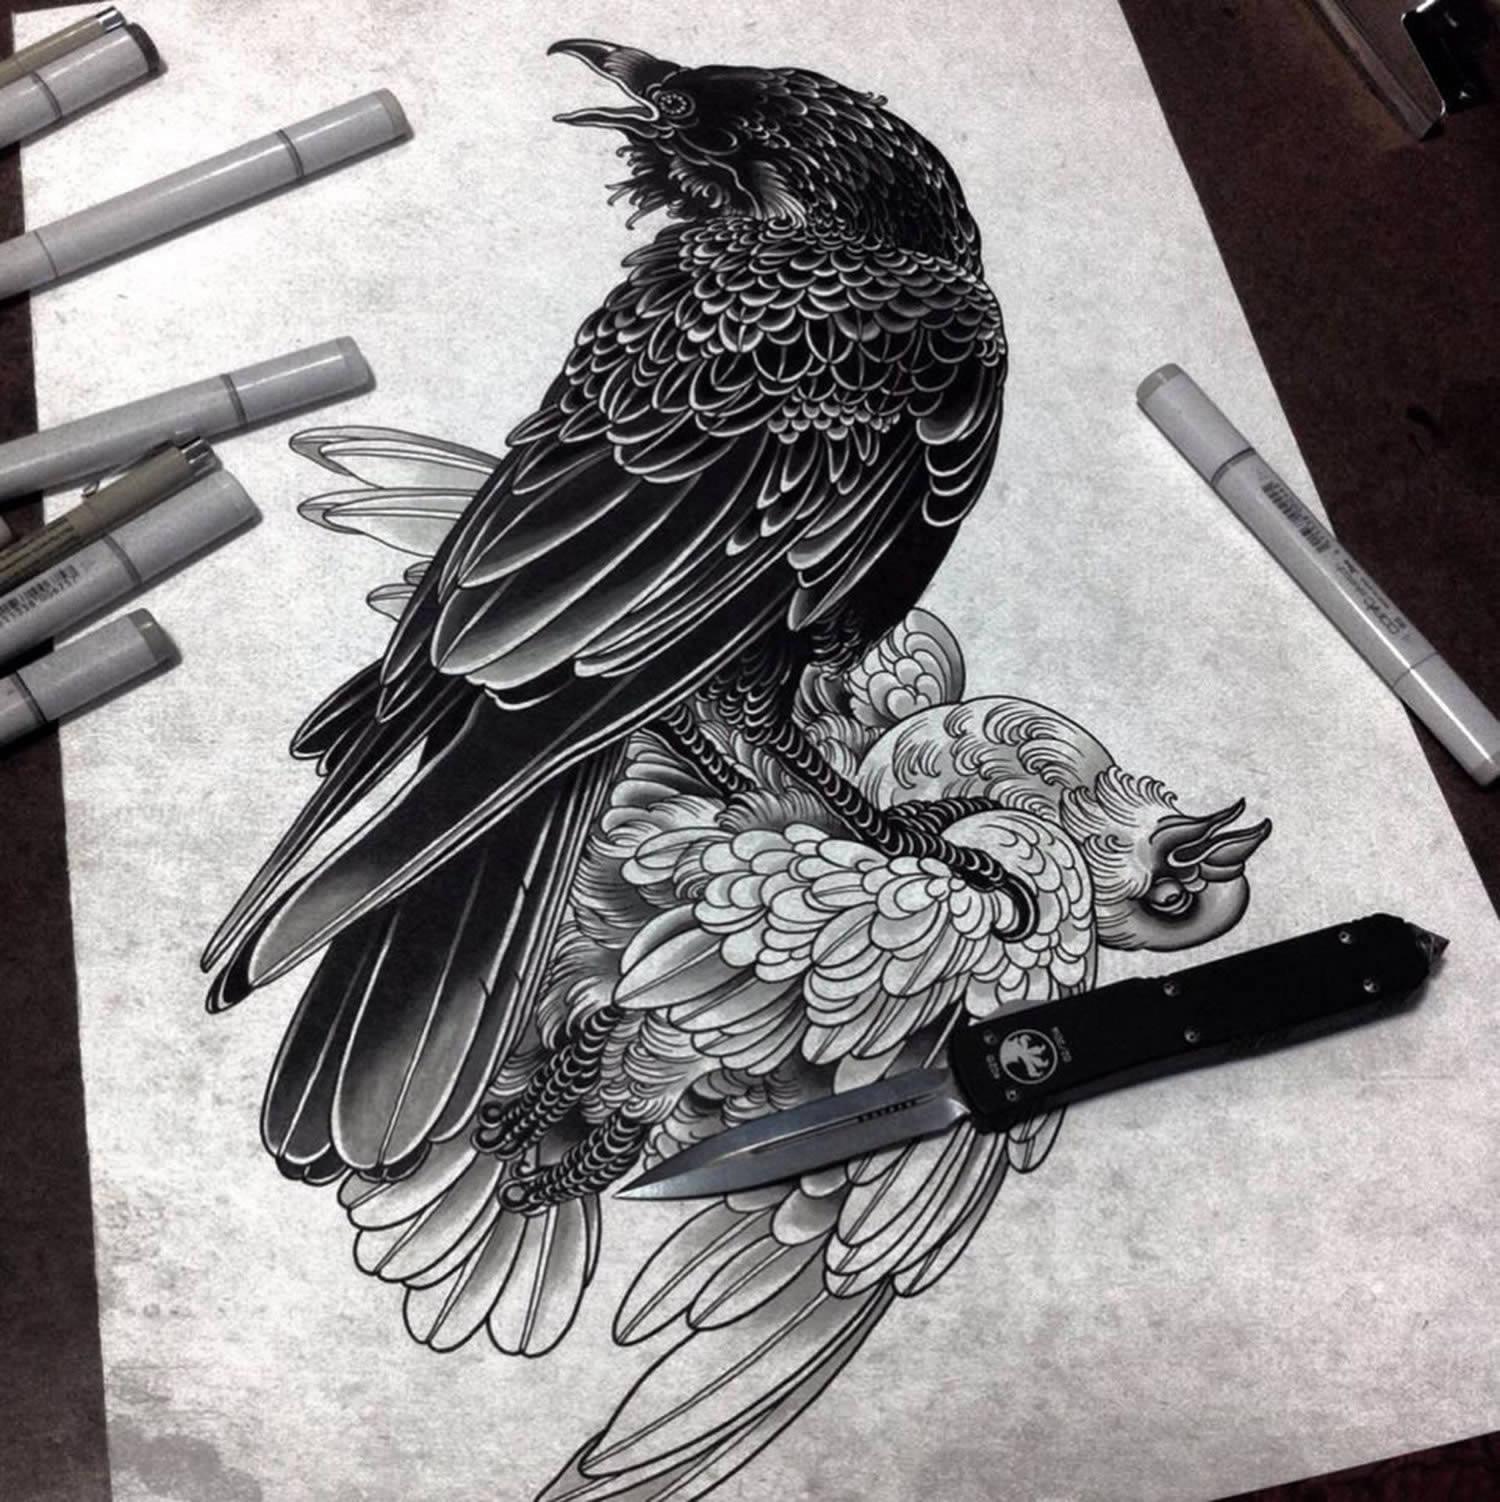 evil and good bird fight tattoo design by alexander grim. Black Bedroom Furniture Sets. Home Design Ideas